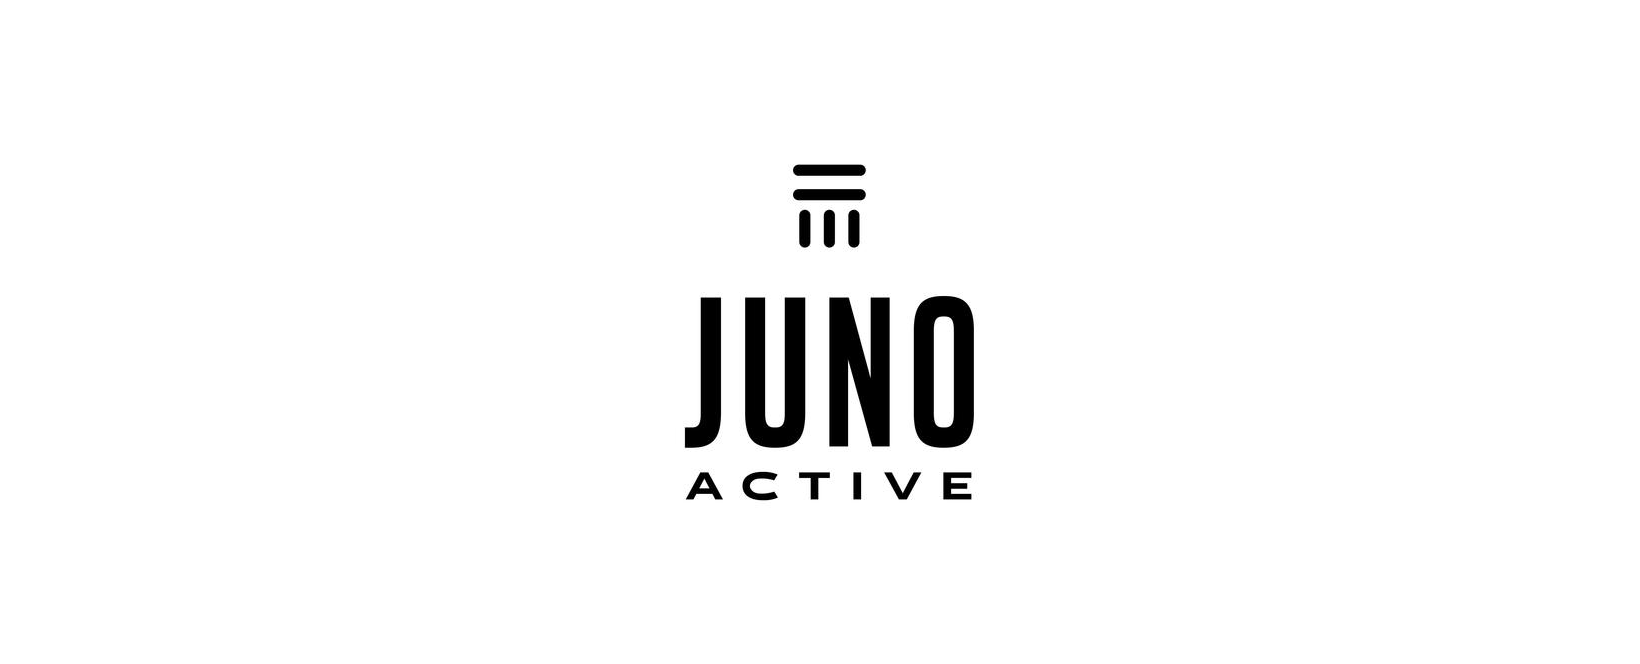 Junoactive Coupon Code 2021